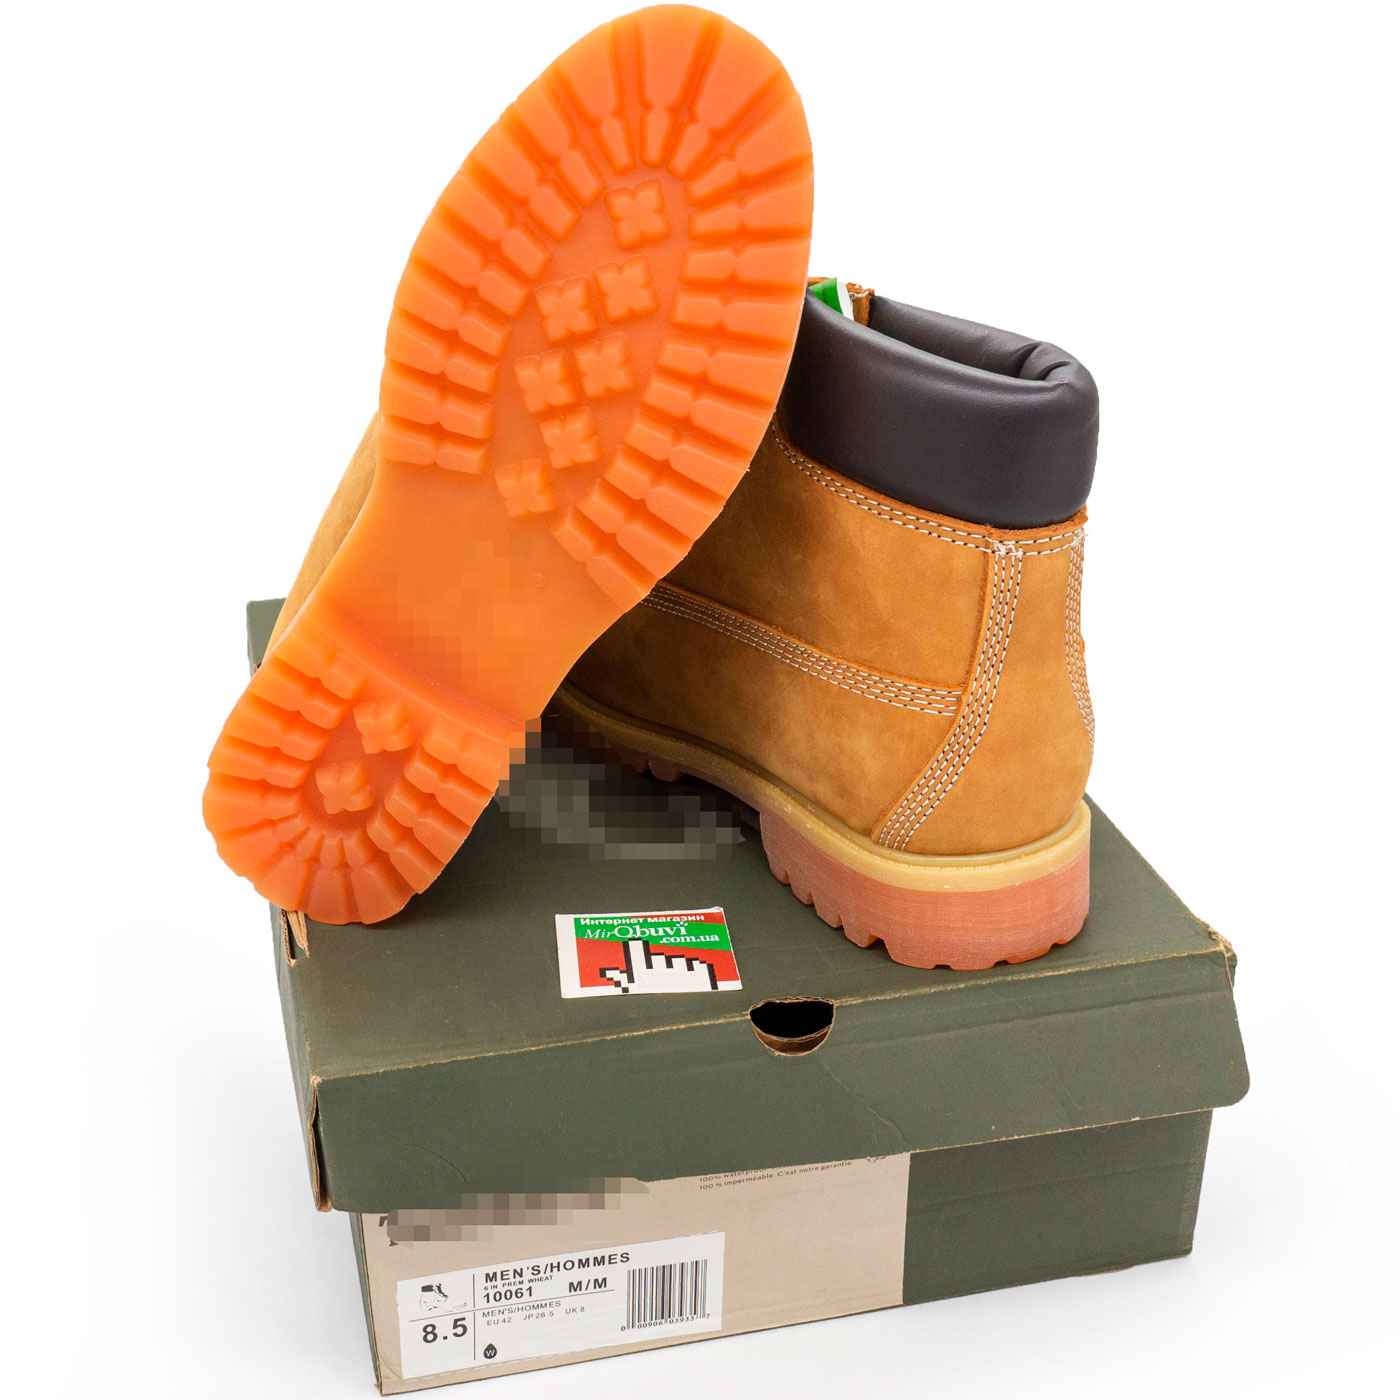 фото back Зимние ботинки Тимберленд 10061 c мехом - Реплика Топ качество! back